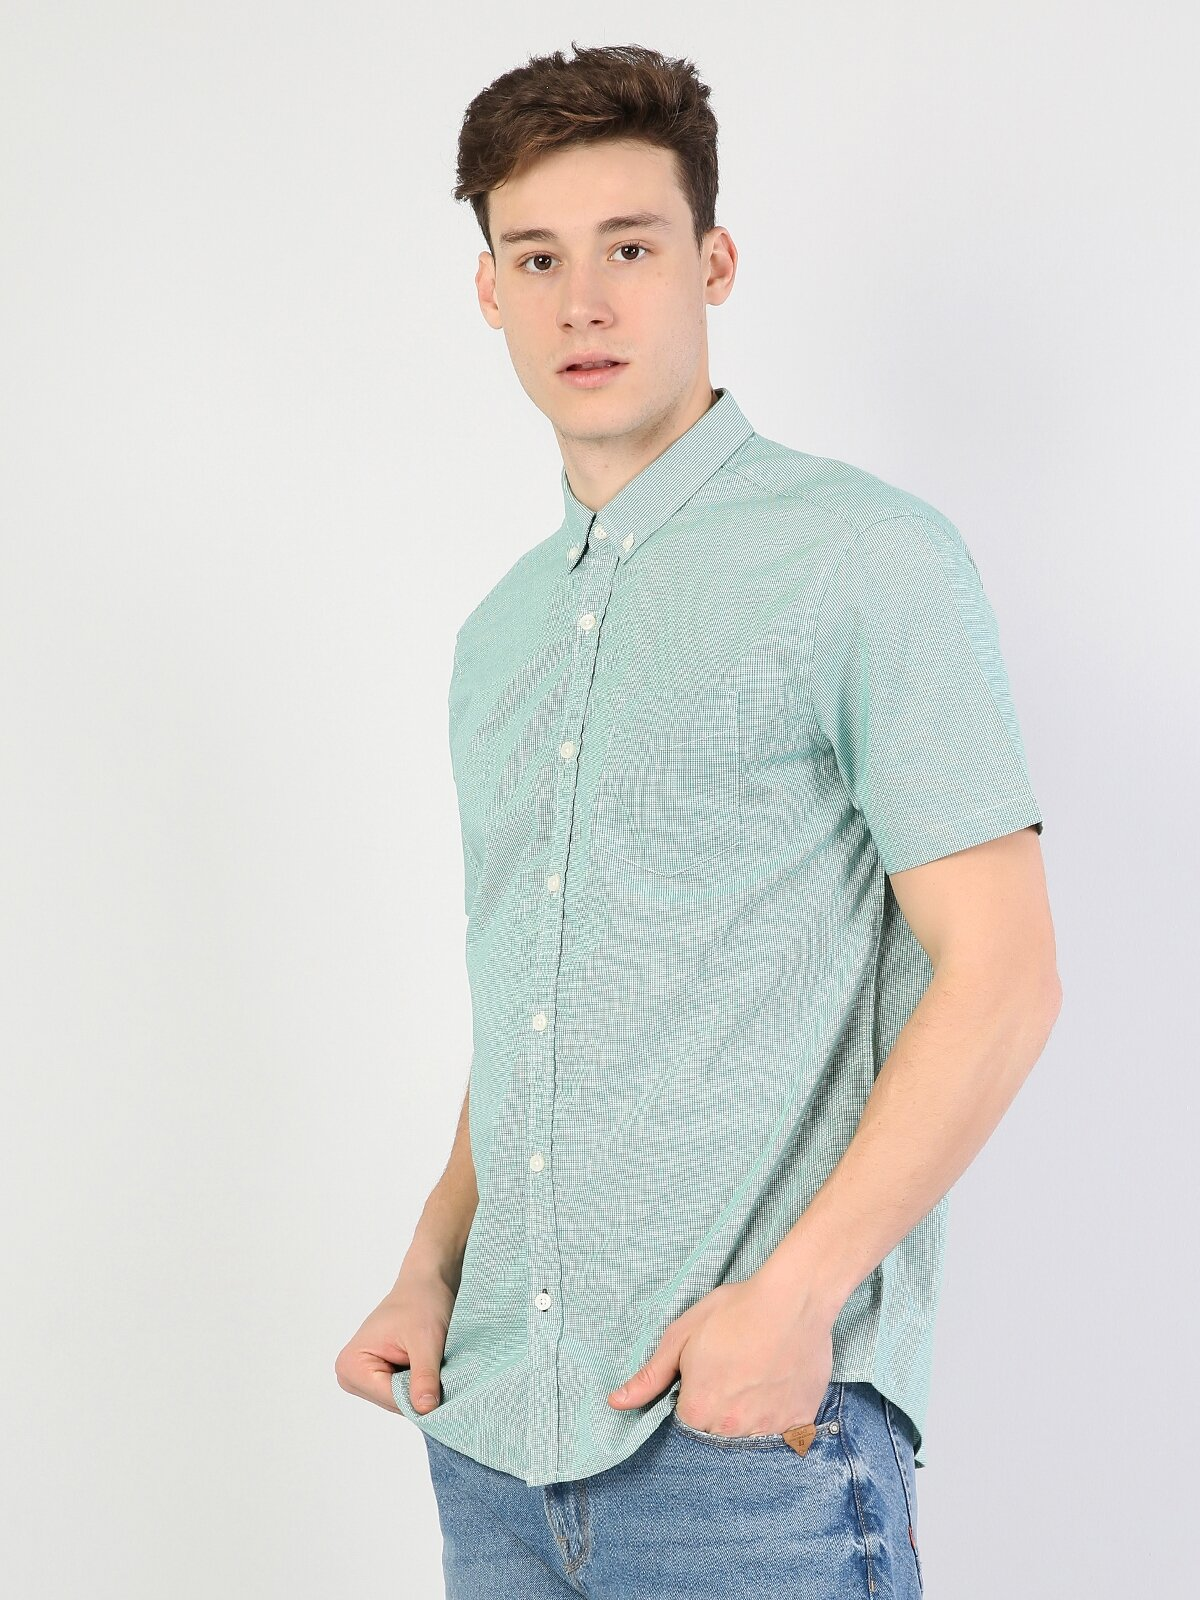 Regular Fit Yeşil Kısa Kol Erkek Oxford Gömlek